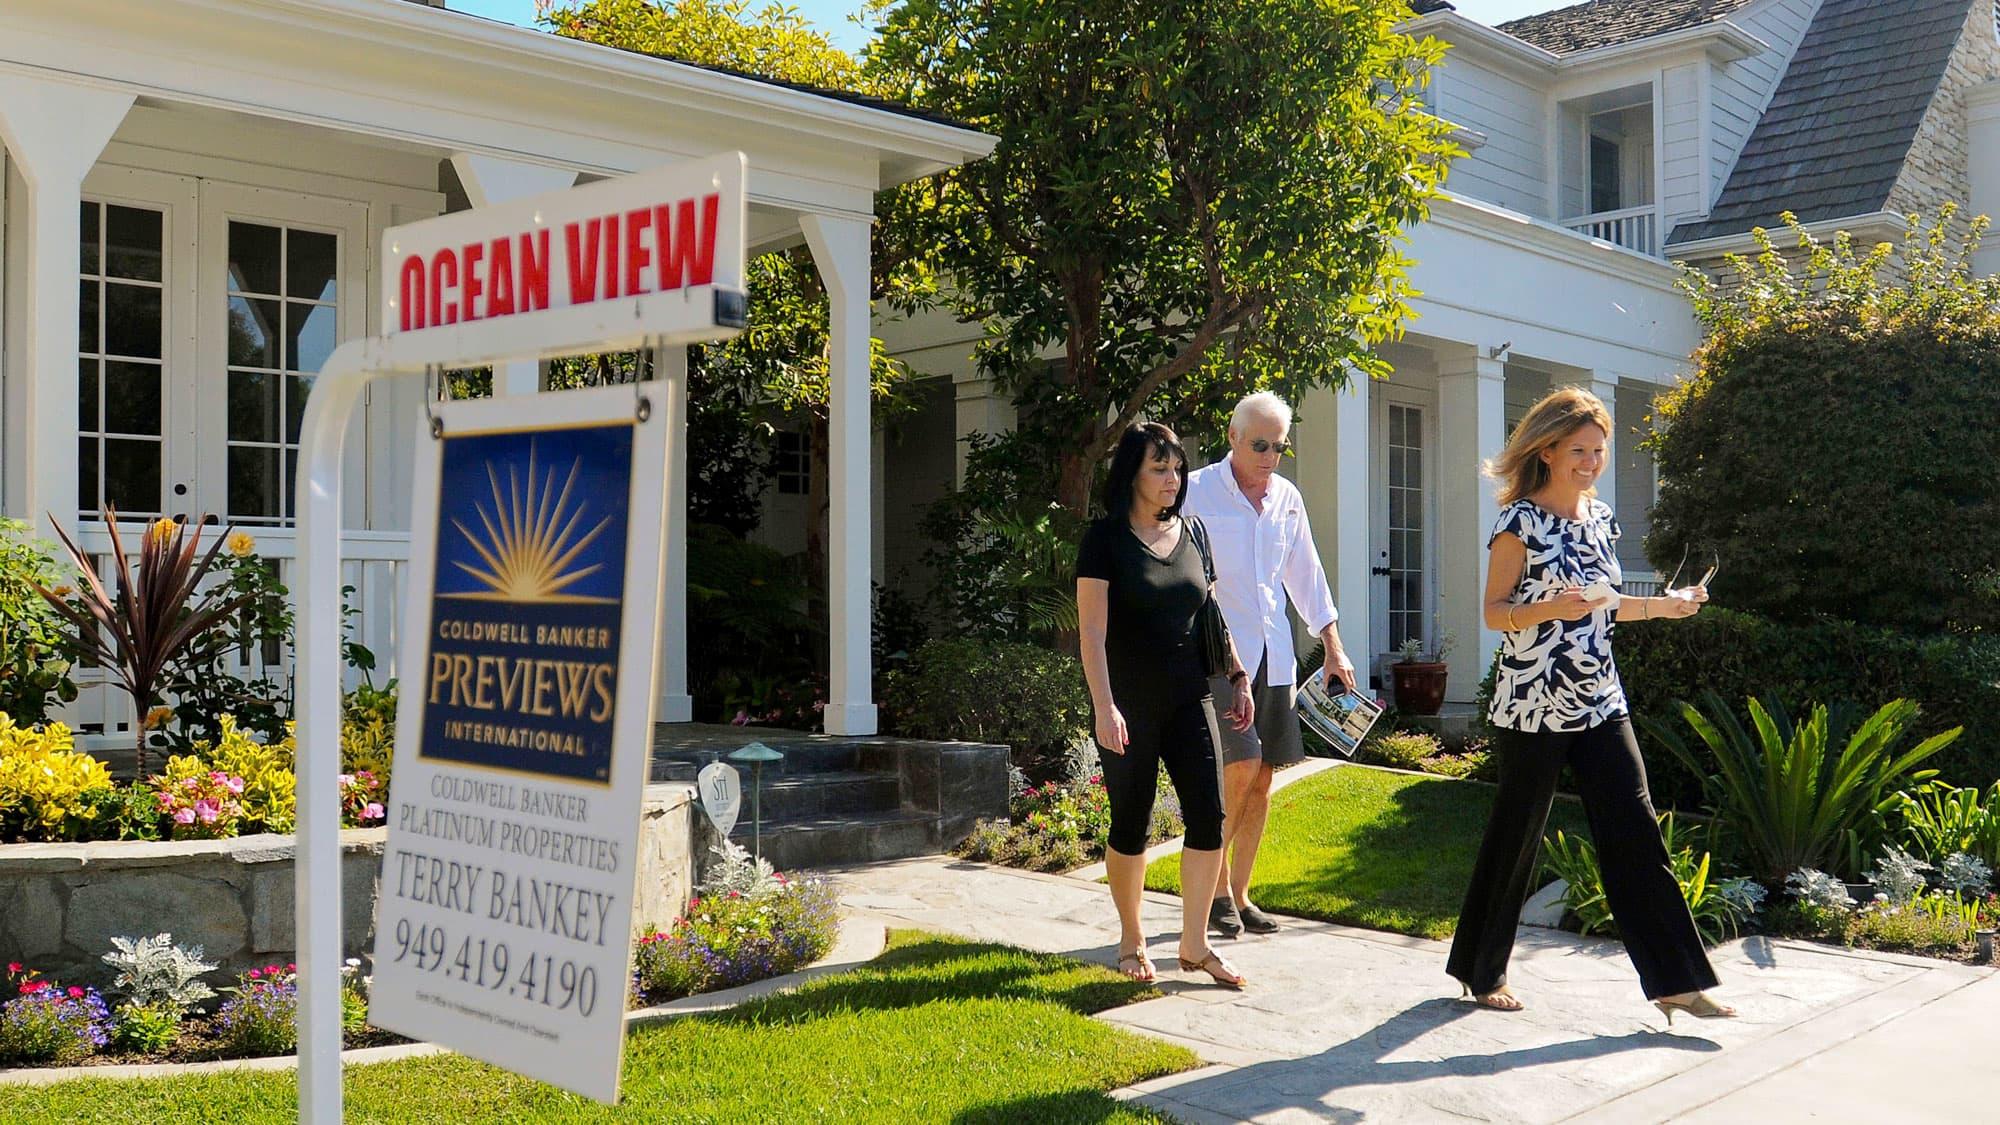 GP: House for sale prospective buyers realtor 101009